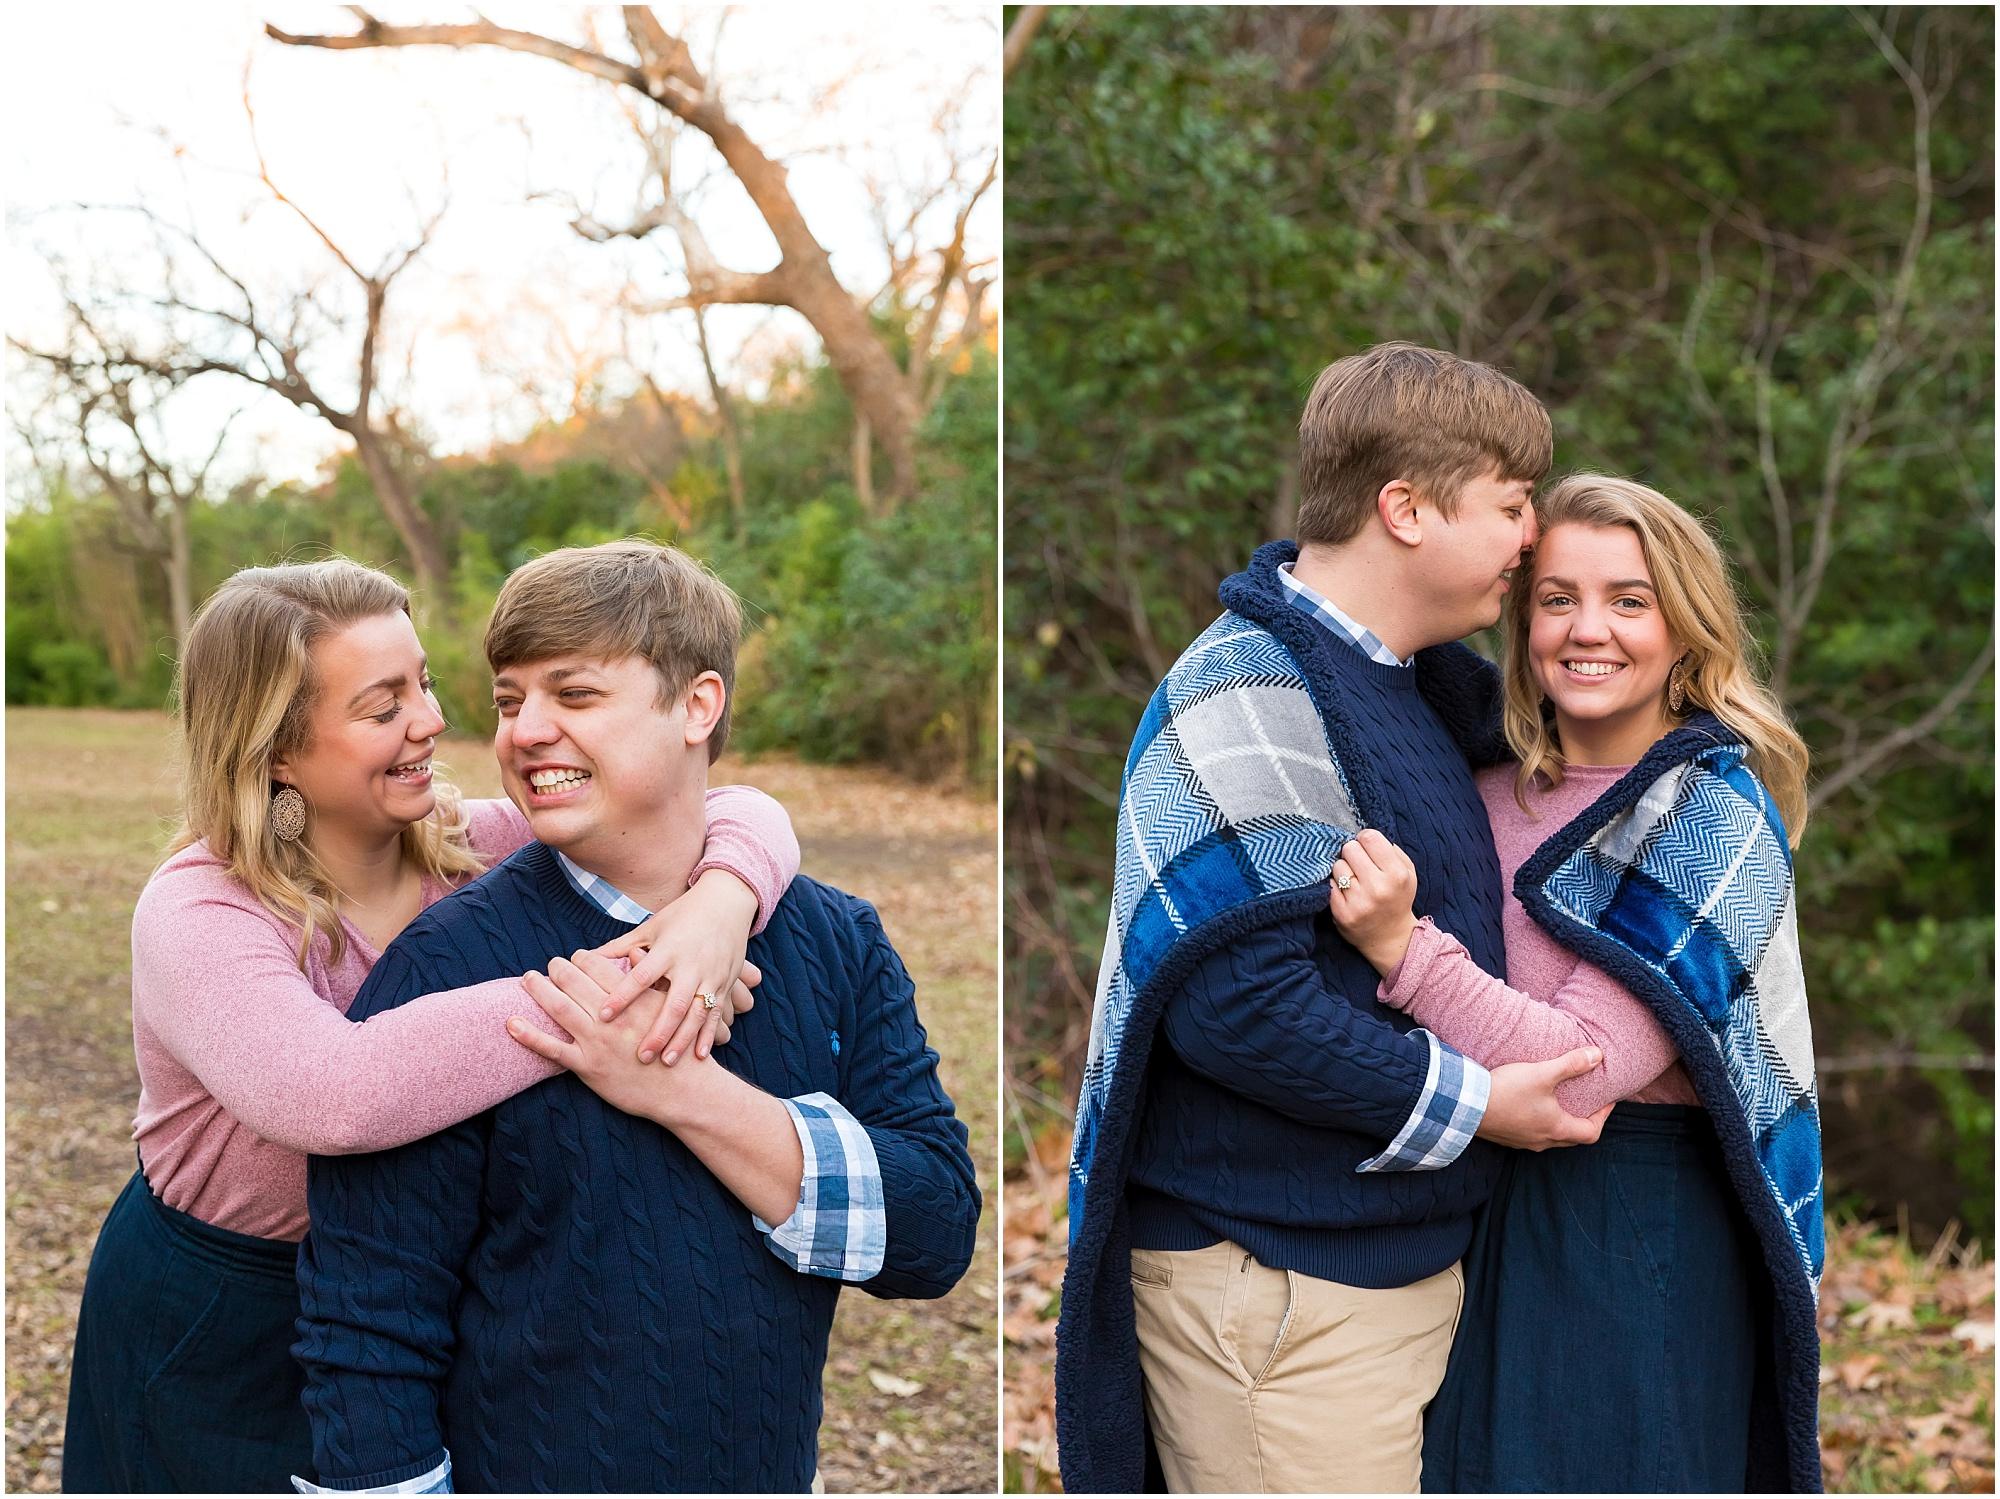 Sunrise-Engagements-Cameron-Park-Waco_0004.jpg